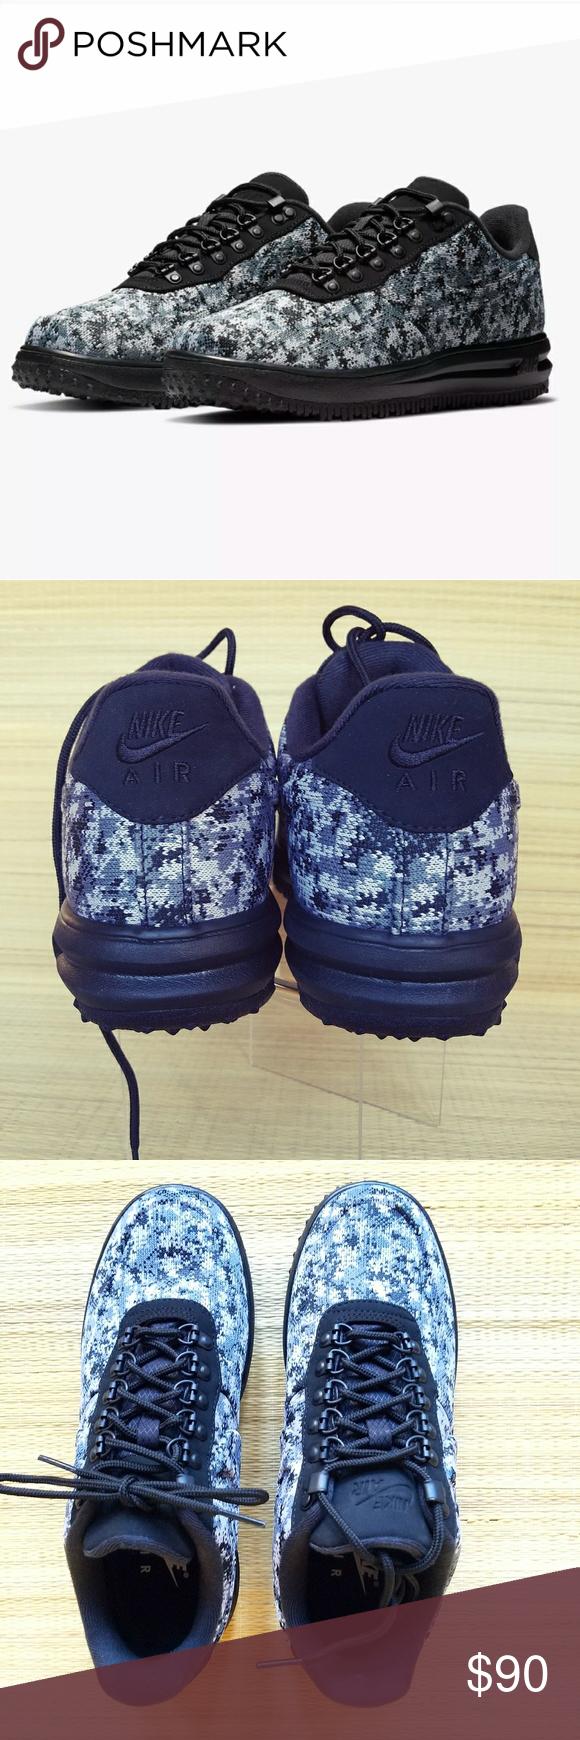 e92650424ad07 Nike LF1 Duckboot Low gray digital textile men's 8 Nike LF1 duckboot low  digital textile camo